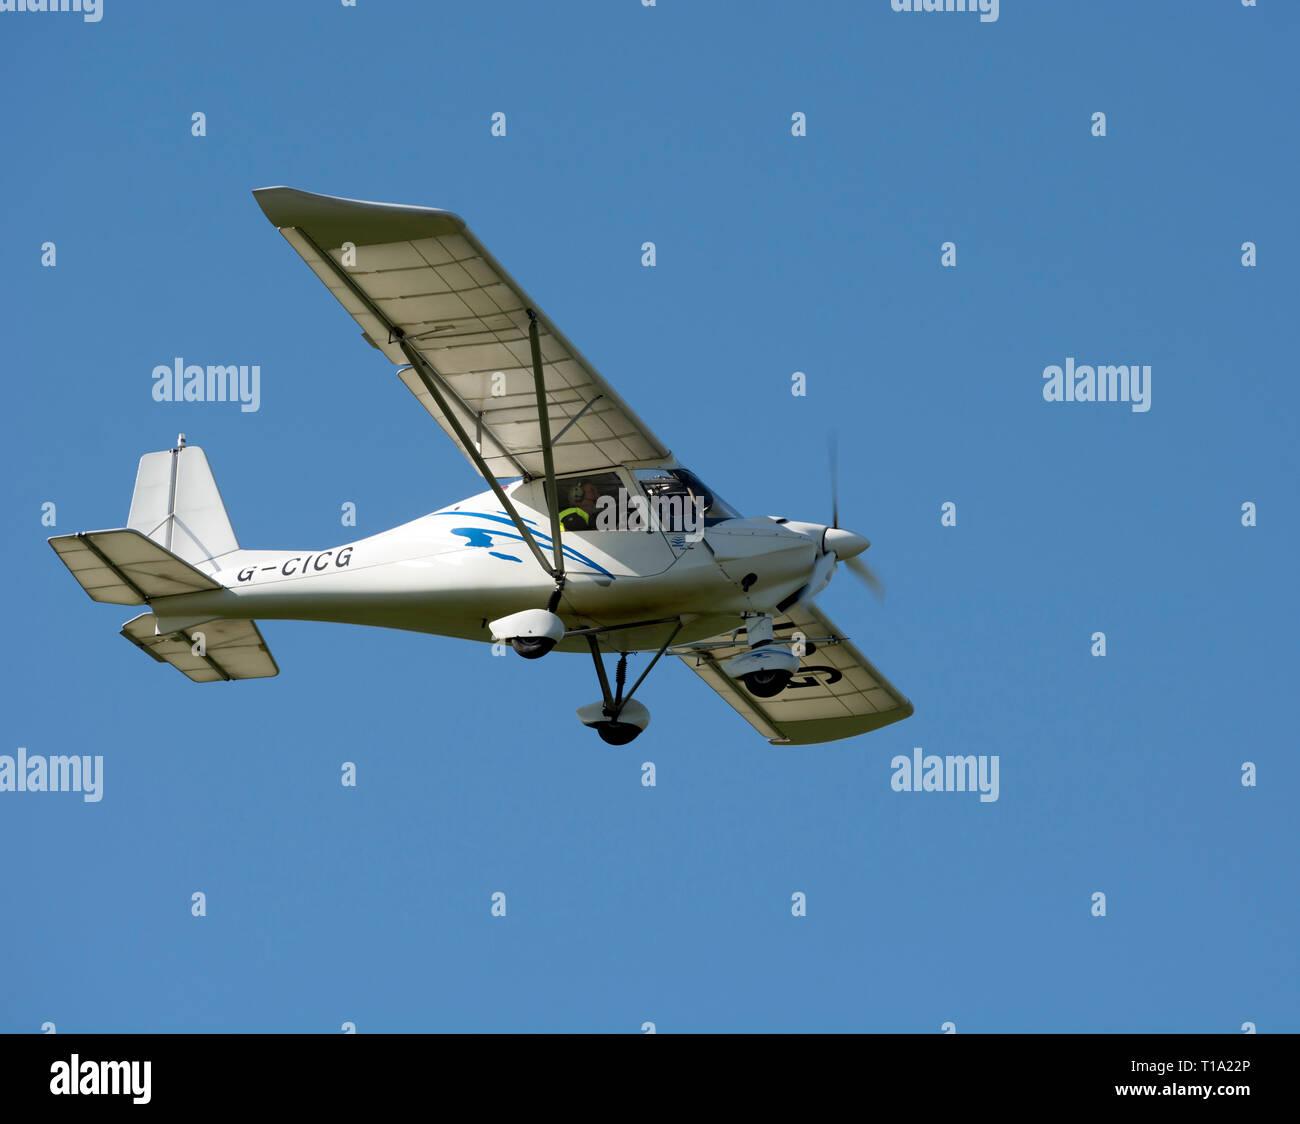 Microlight Plane Stock Photos & Microlight Plane Stock Images - Page